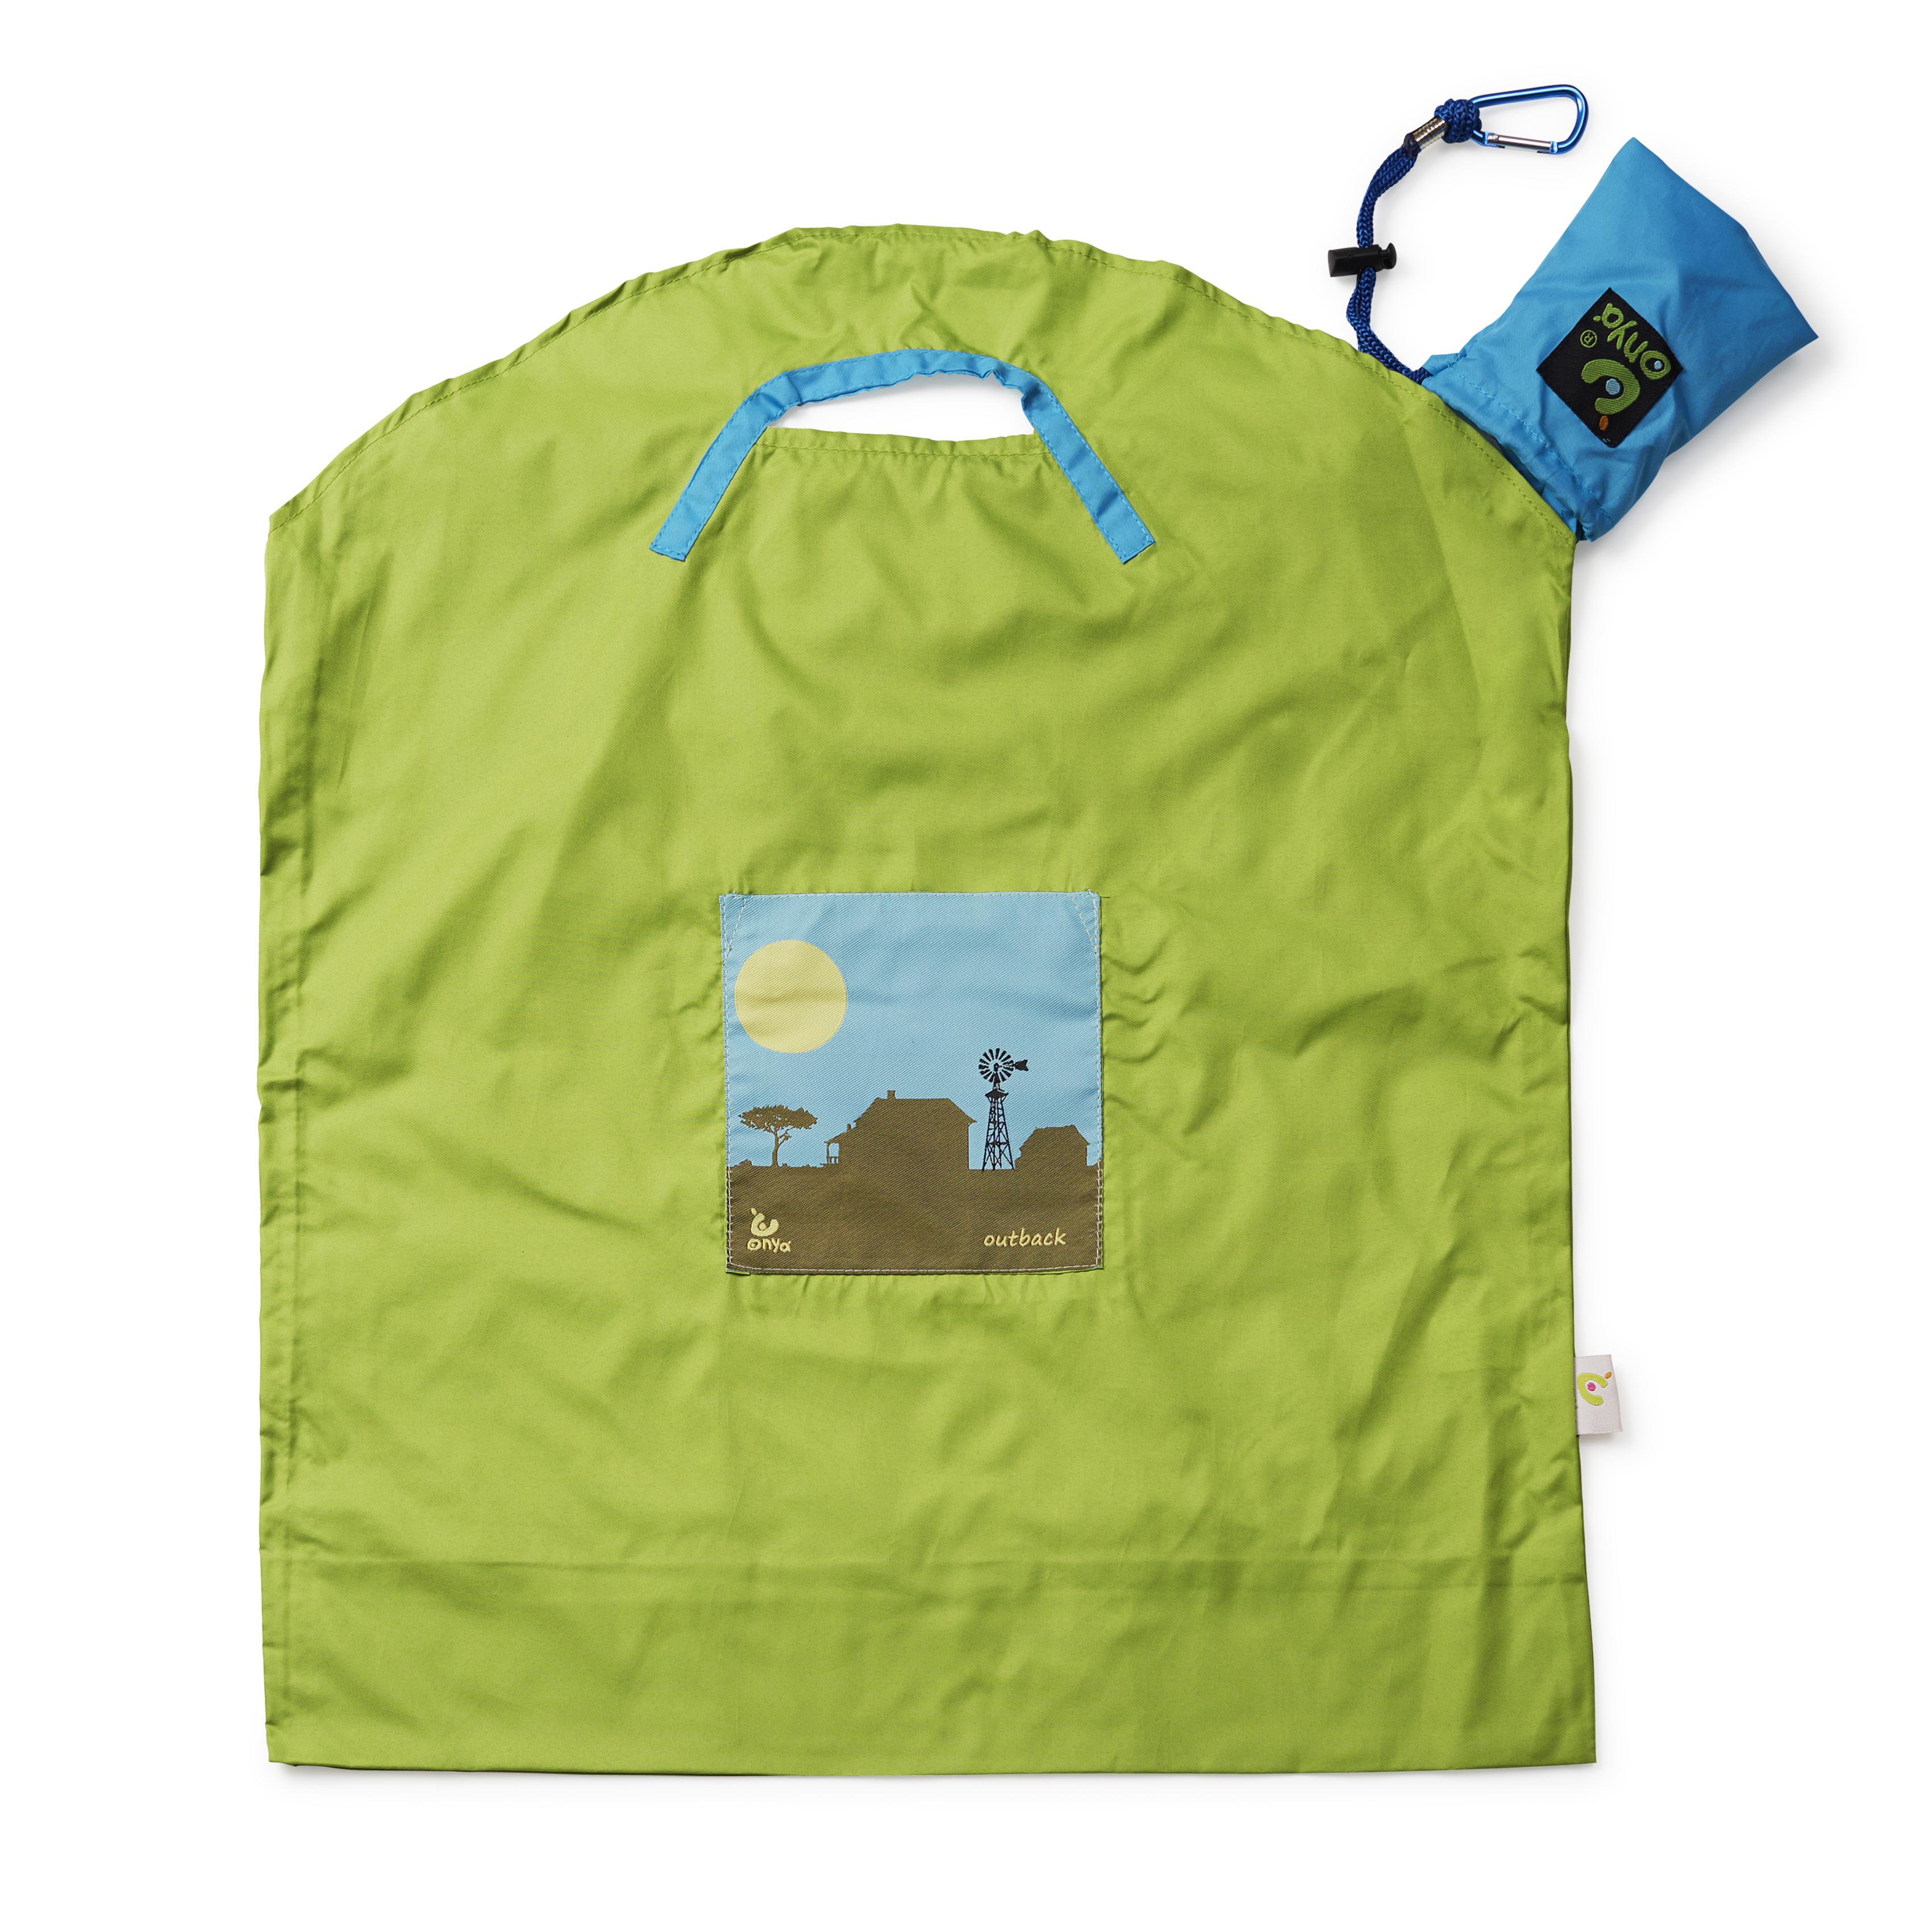 Onya Reusable Shopping Bag Outback – Large